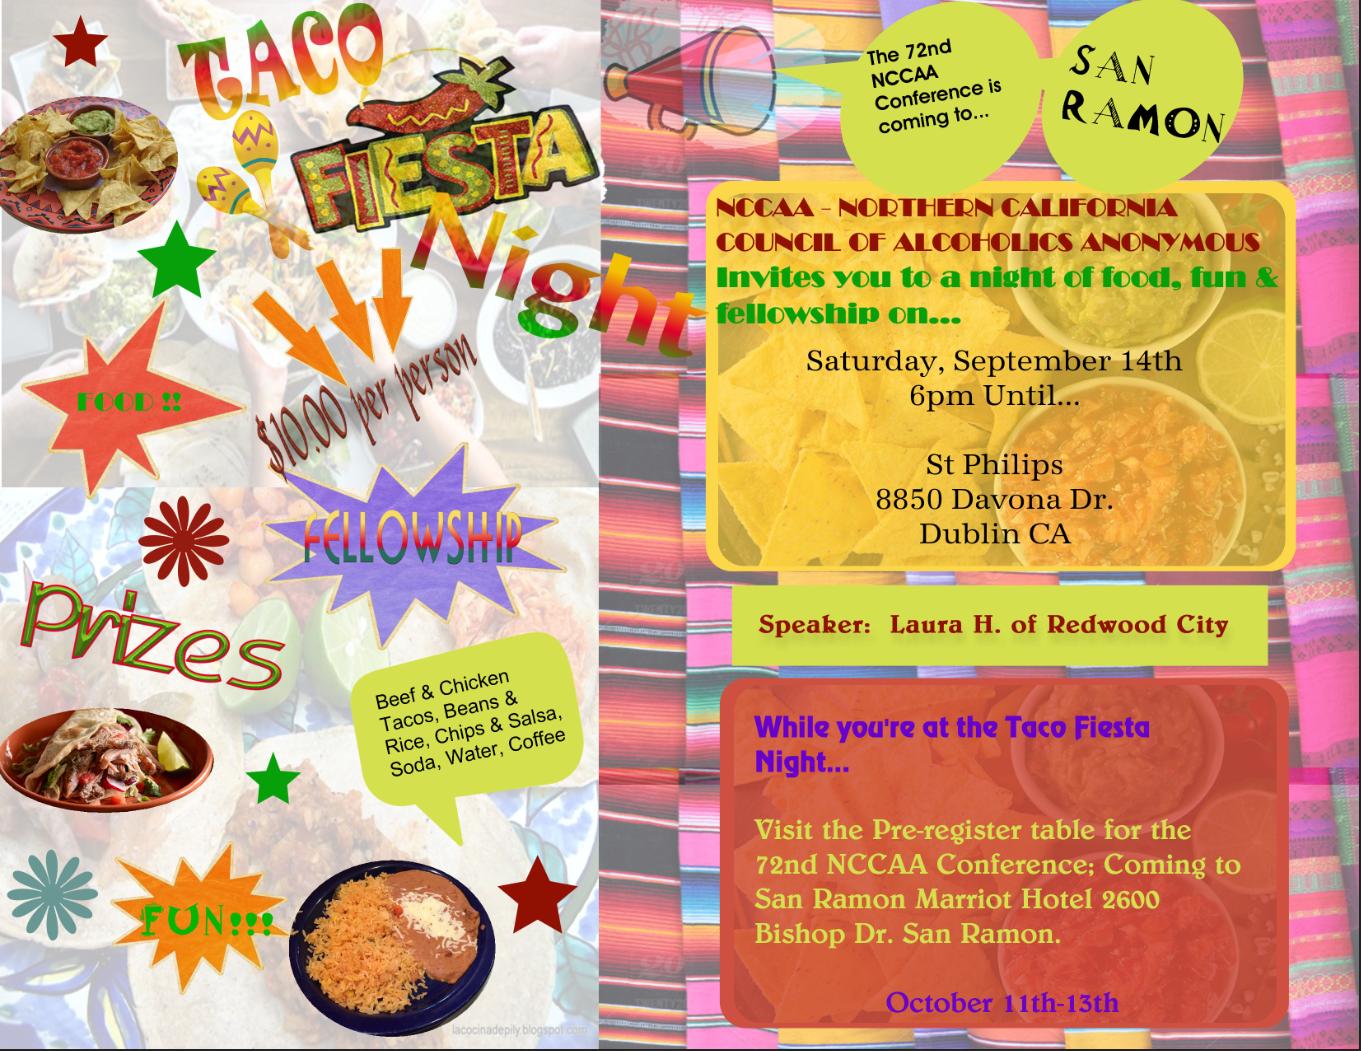 Taco Night Fiesta